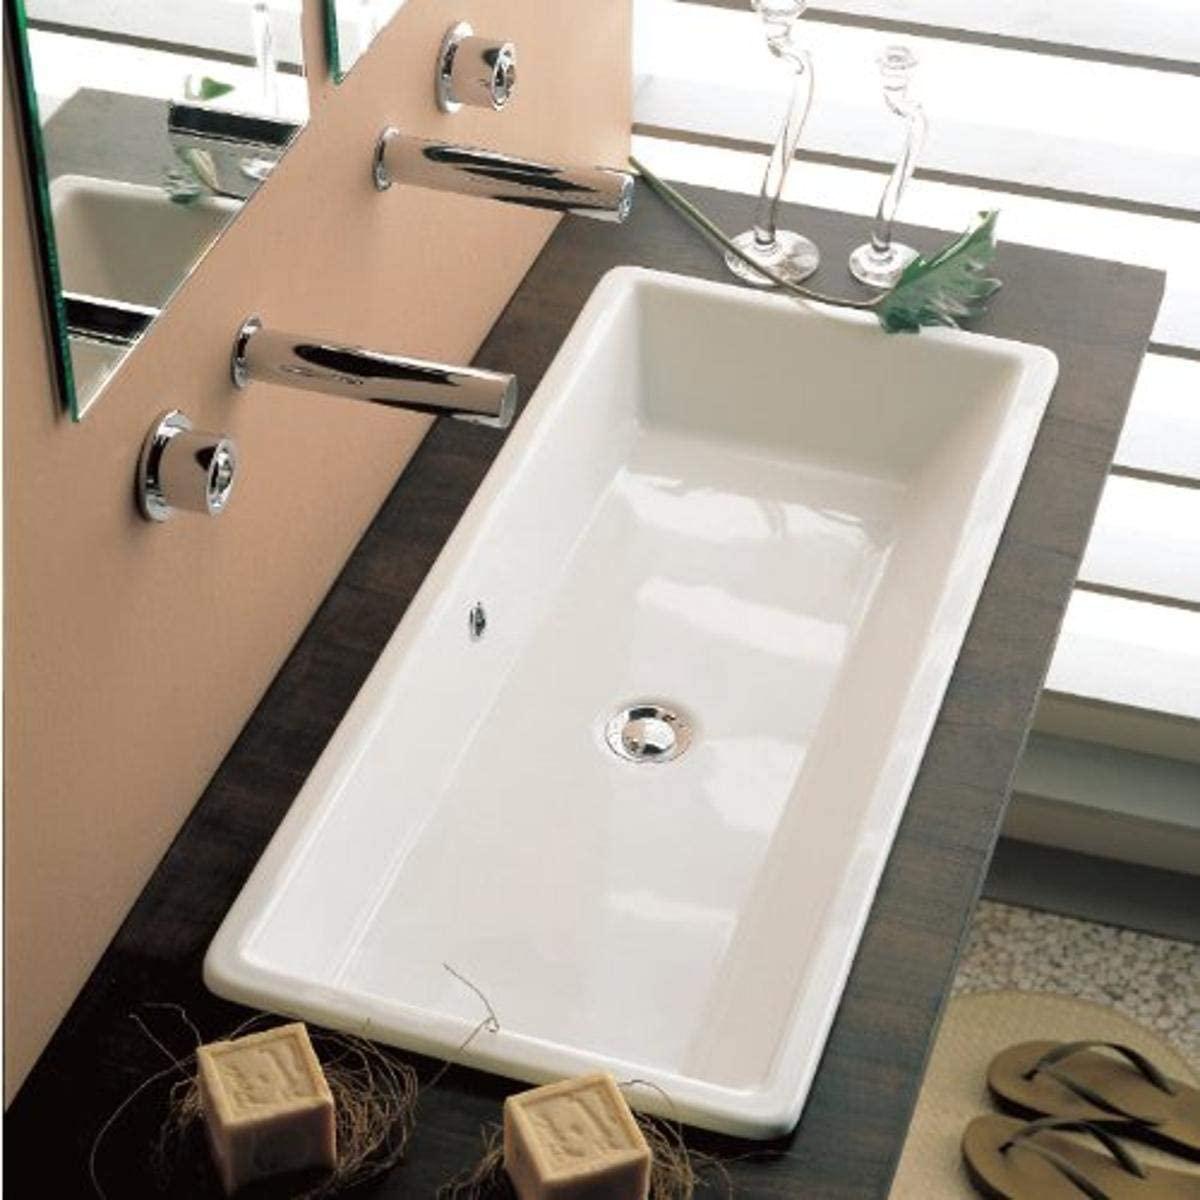 Scarabeo 8033-No Hole Gaia Rectangular Ceramic Self Rimming Vessel Sink, White